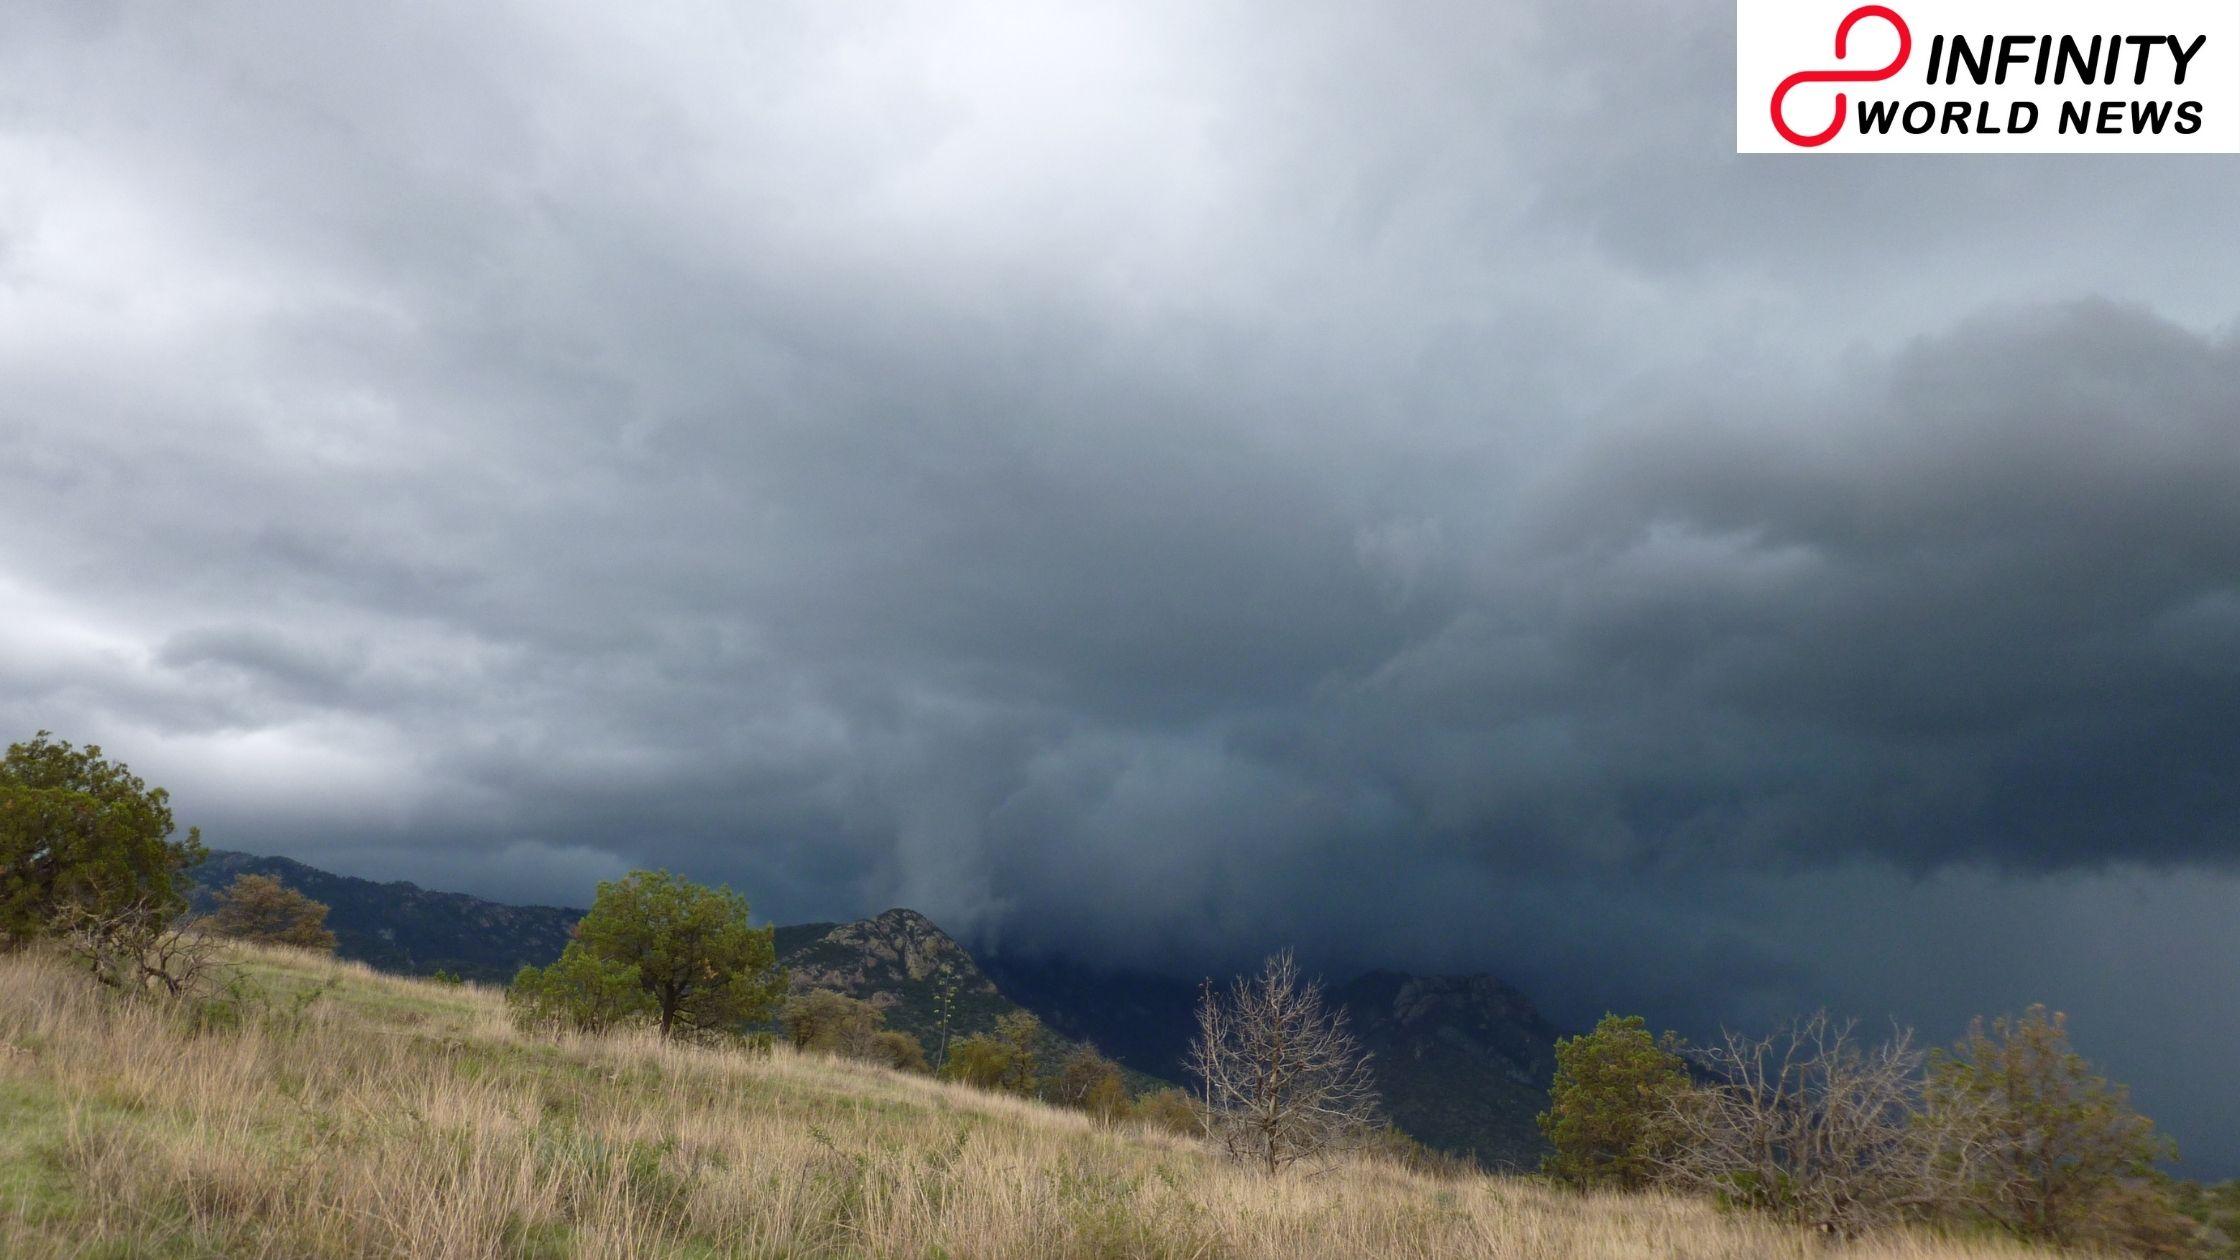 Following Record October Rains, Karnataka Prepares for Fresh Northeast Monsoon Spell That Week